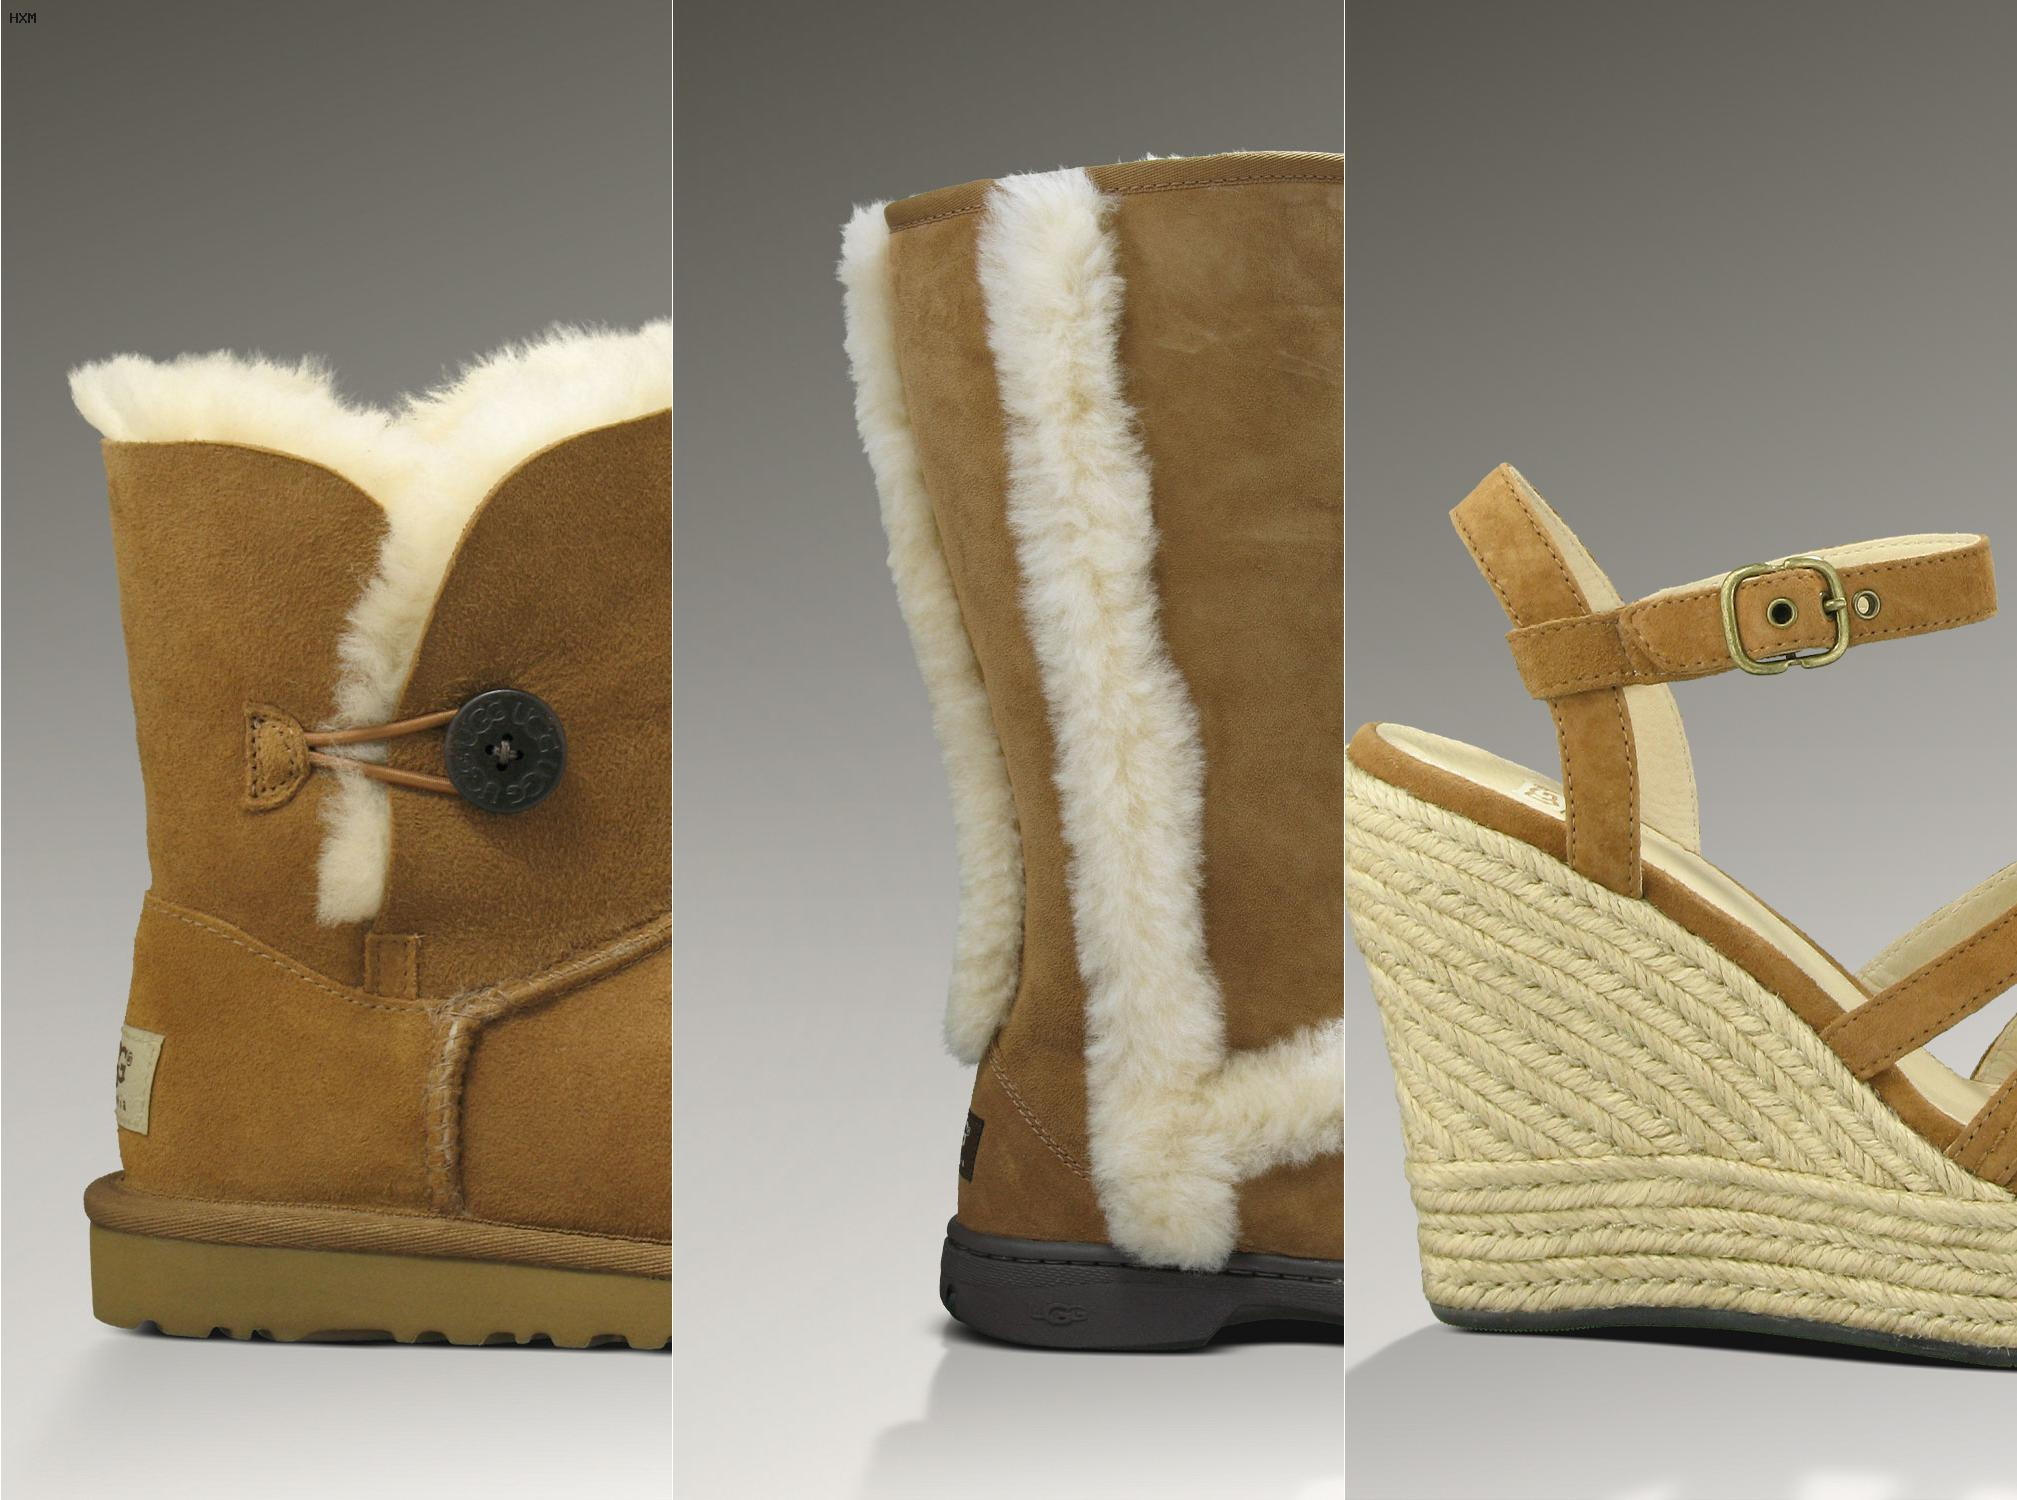 ugg boots nice france